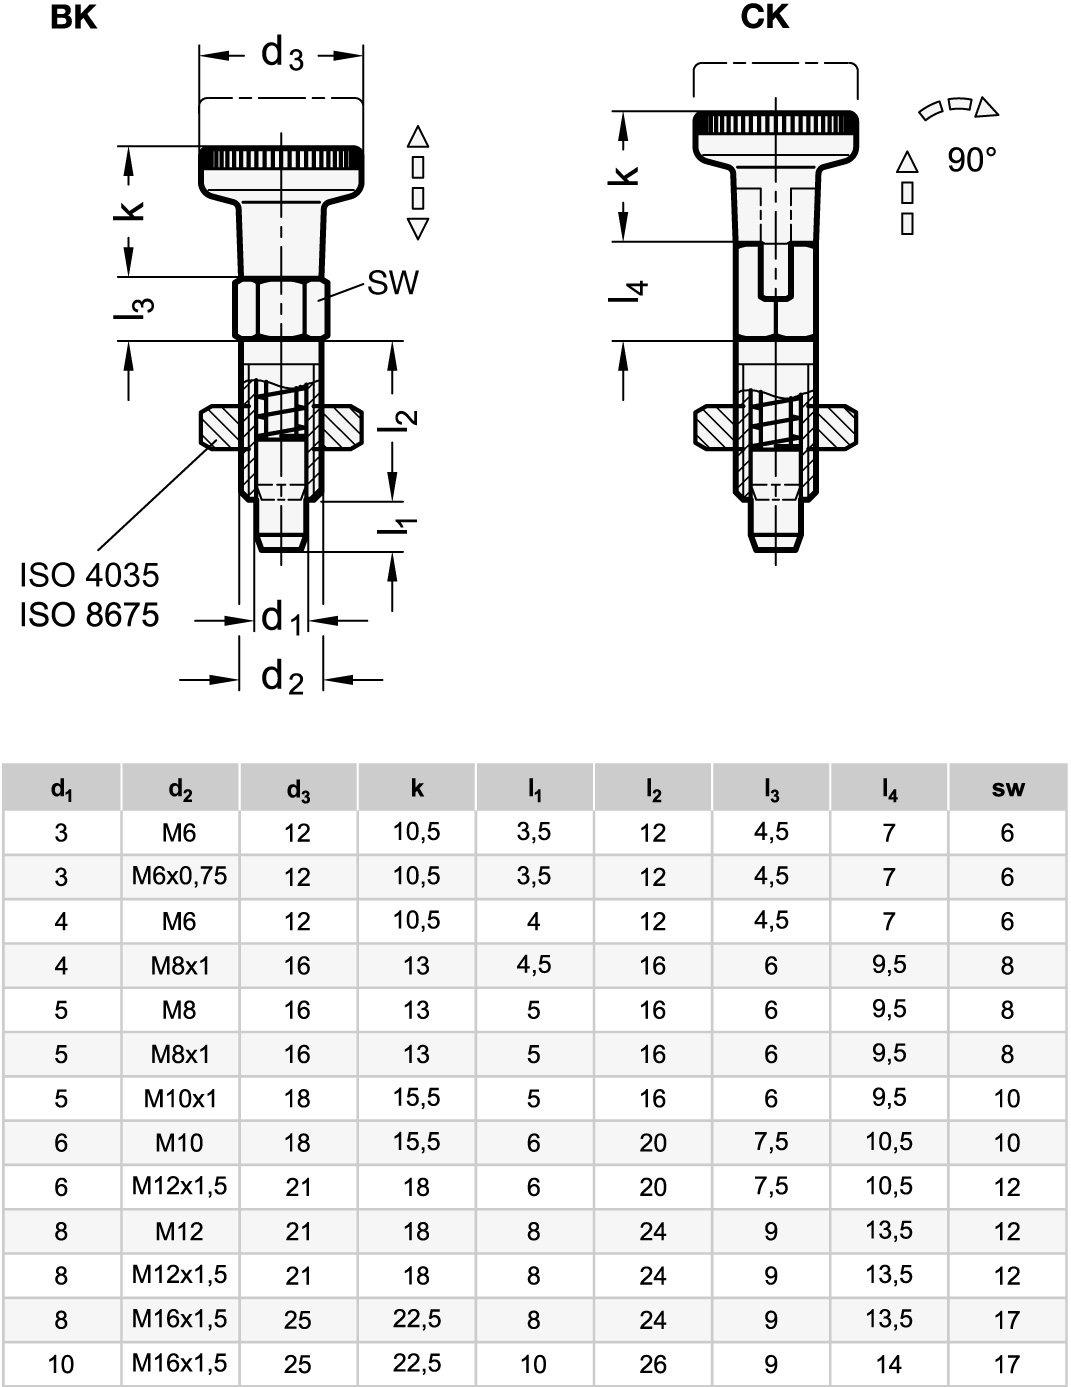 Ganter Normelemente GN 717-3-M6-CK-ST Rastbolzen silber 2 St/ück